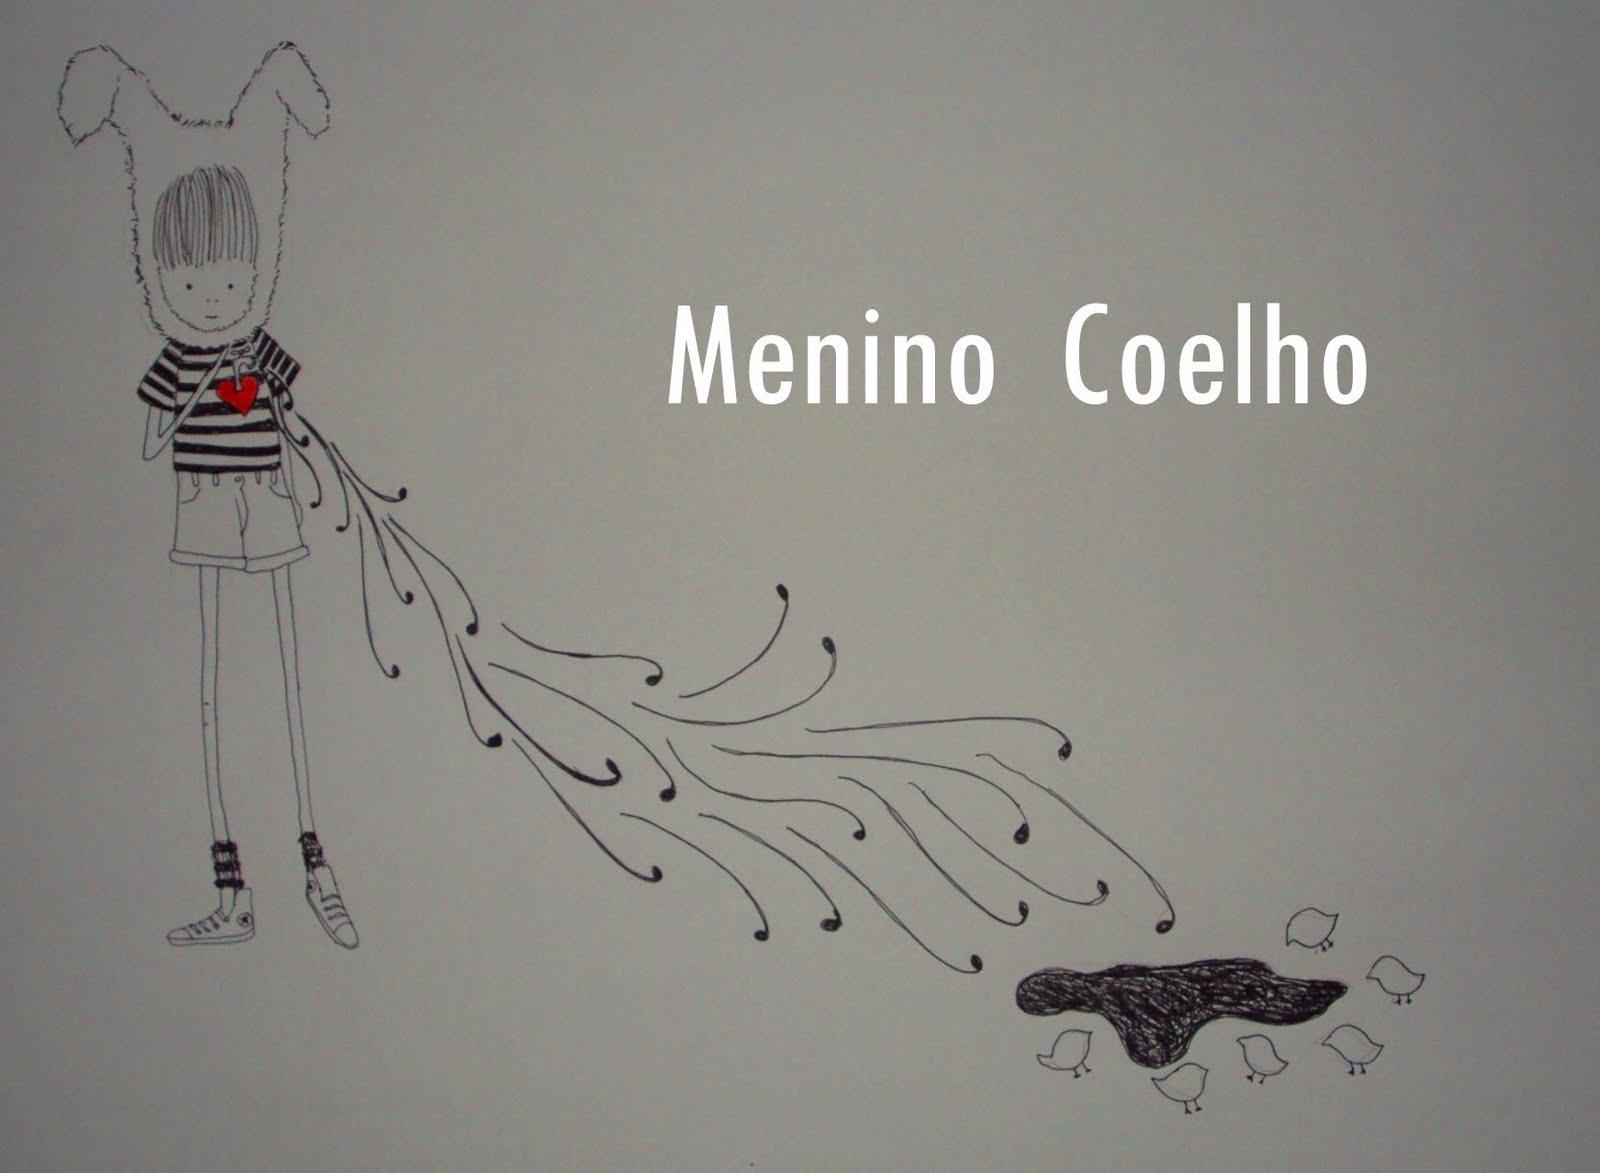 Menino Coelho